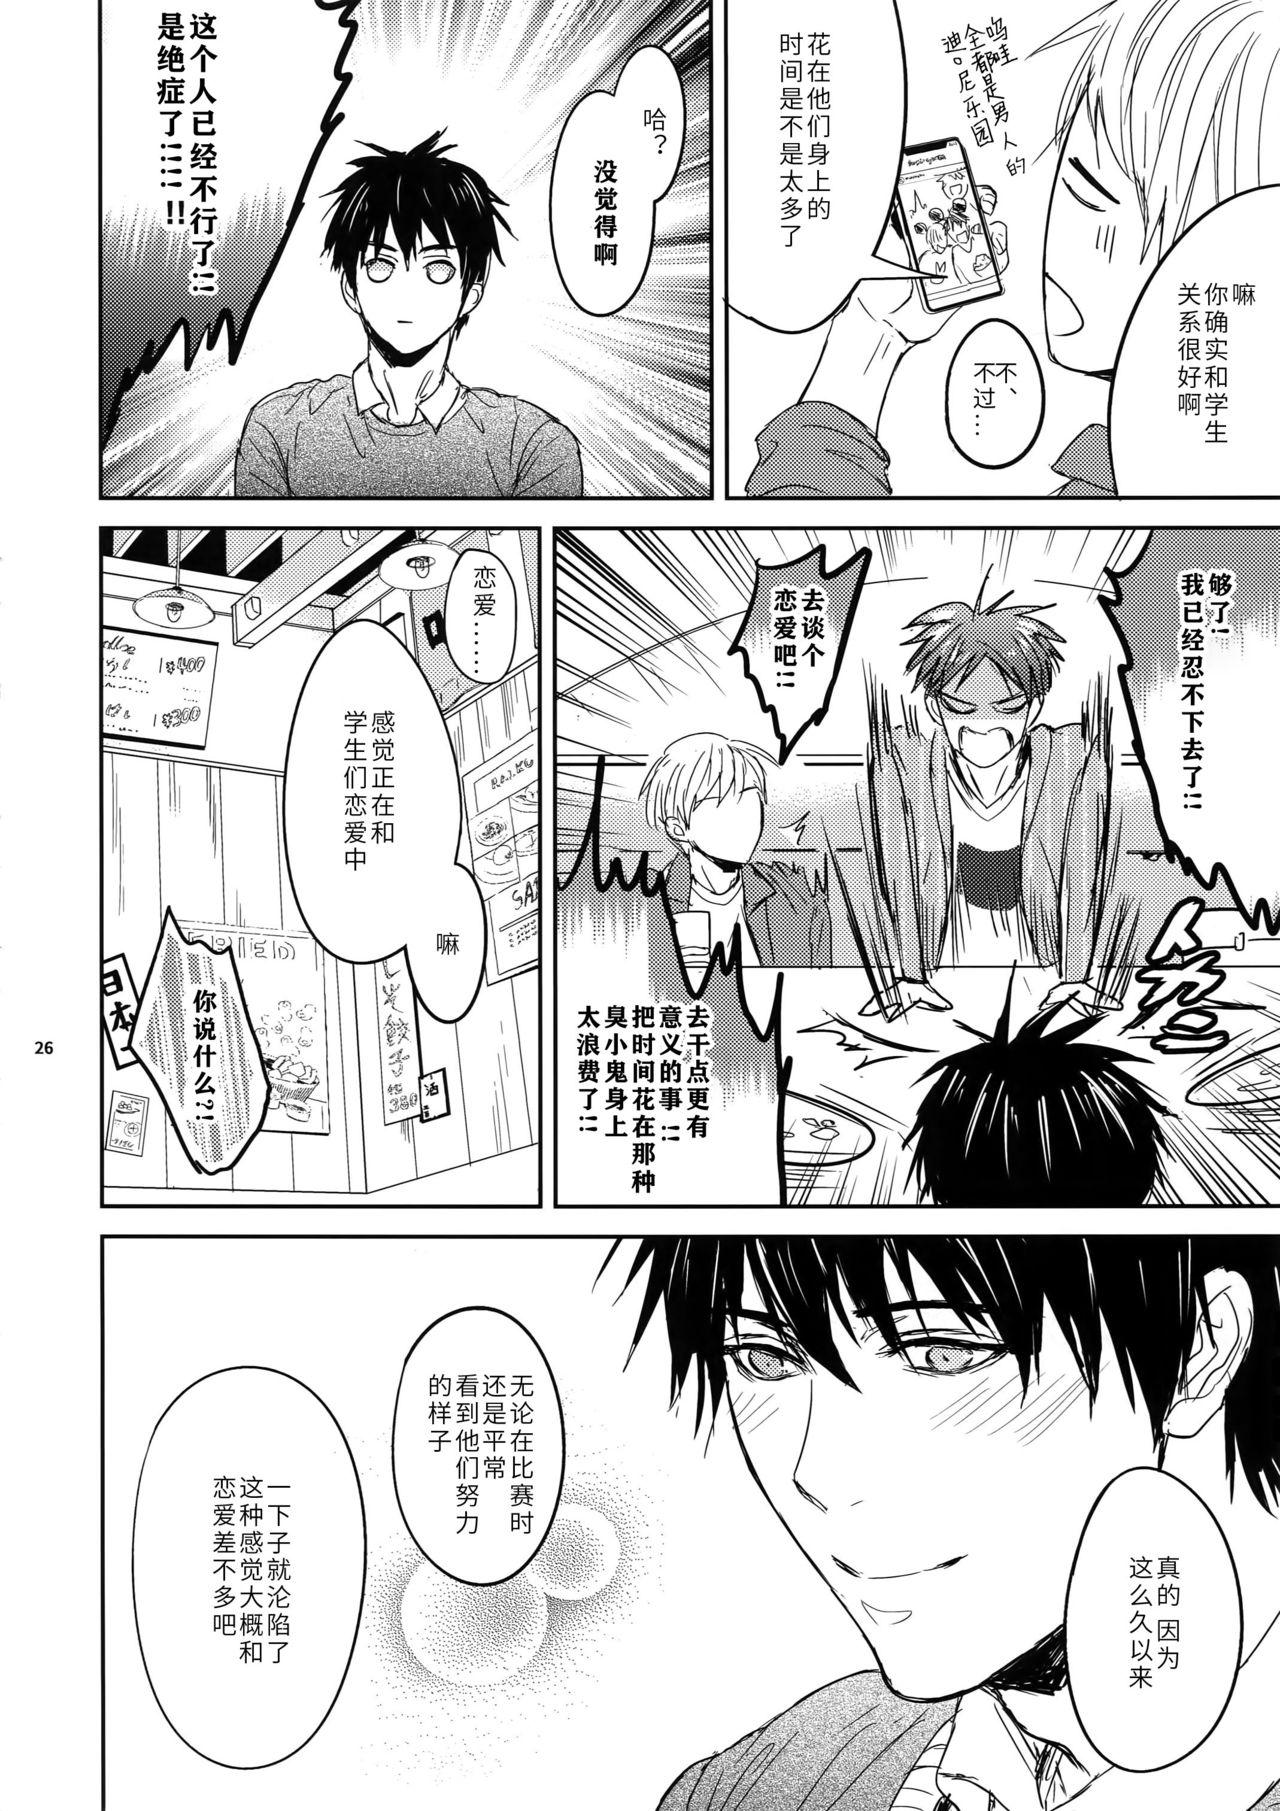 Sensei wa Nekketsu ga Areba Juubunda! | 老师只要热血就够了! 25